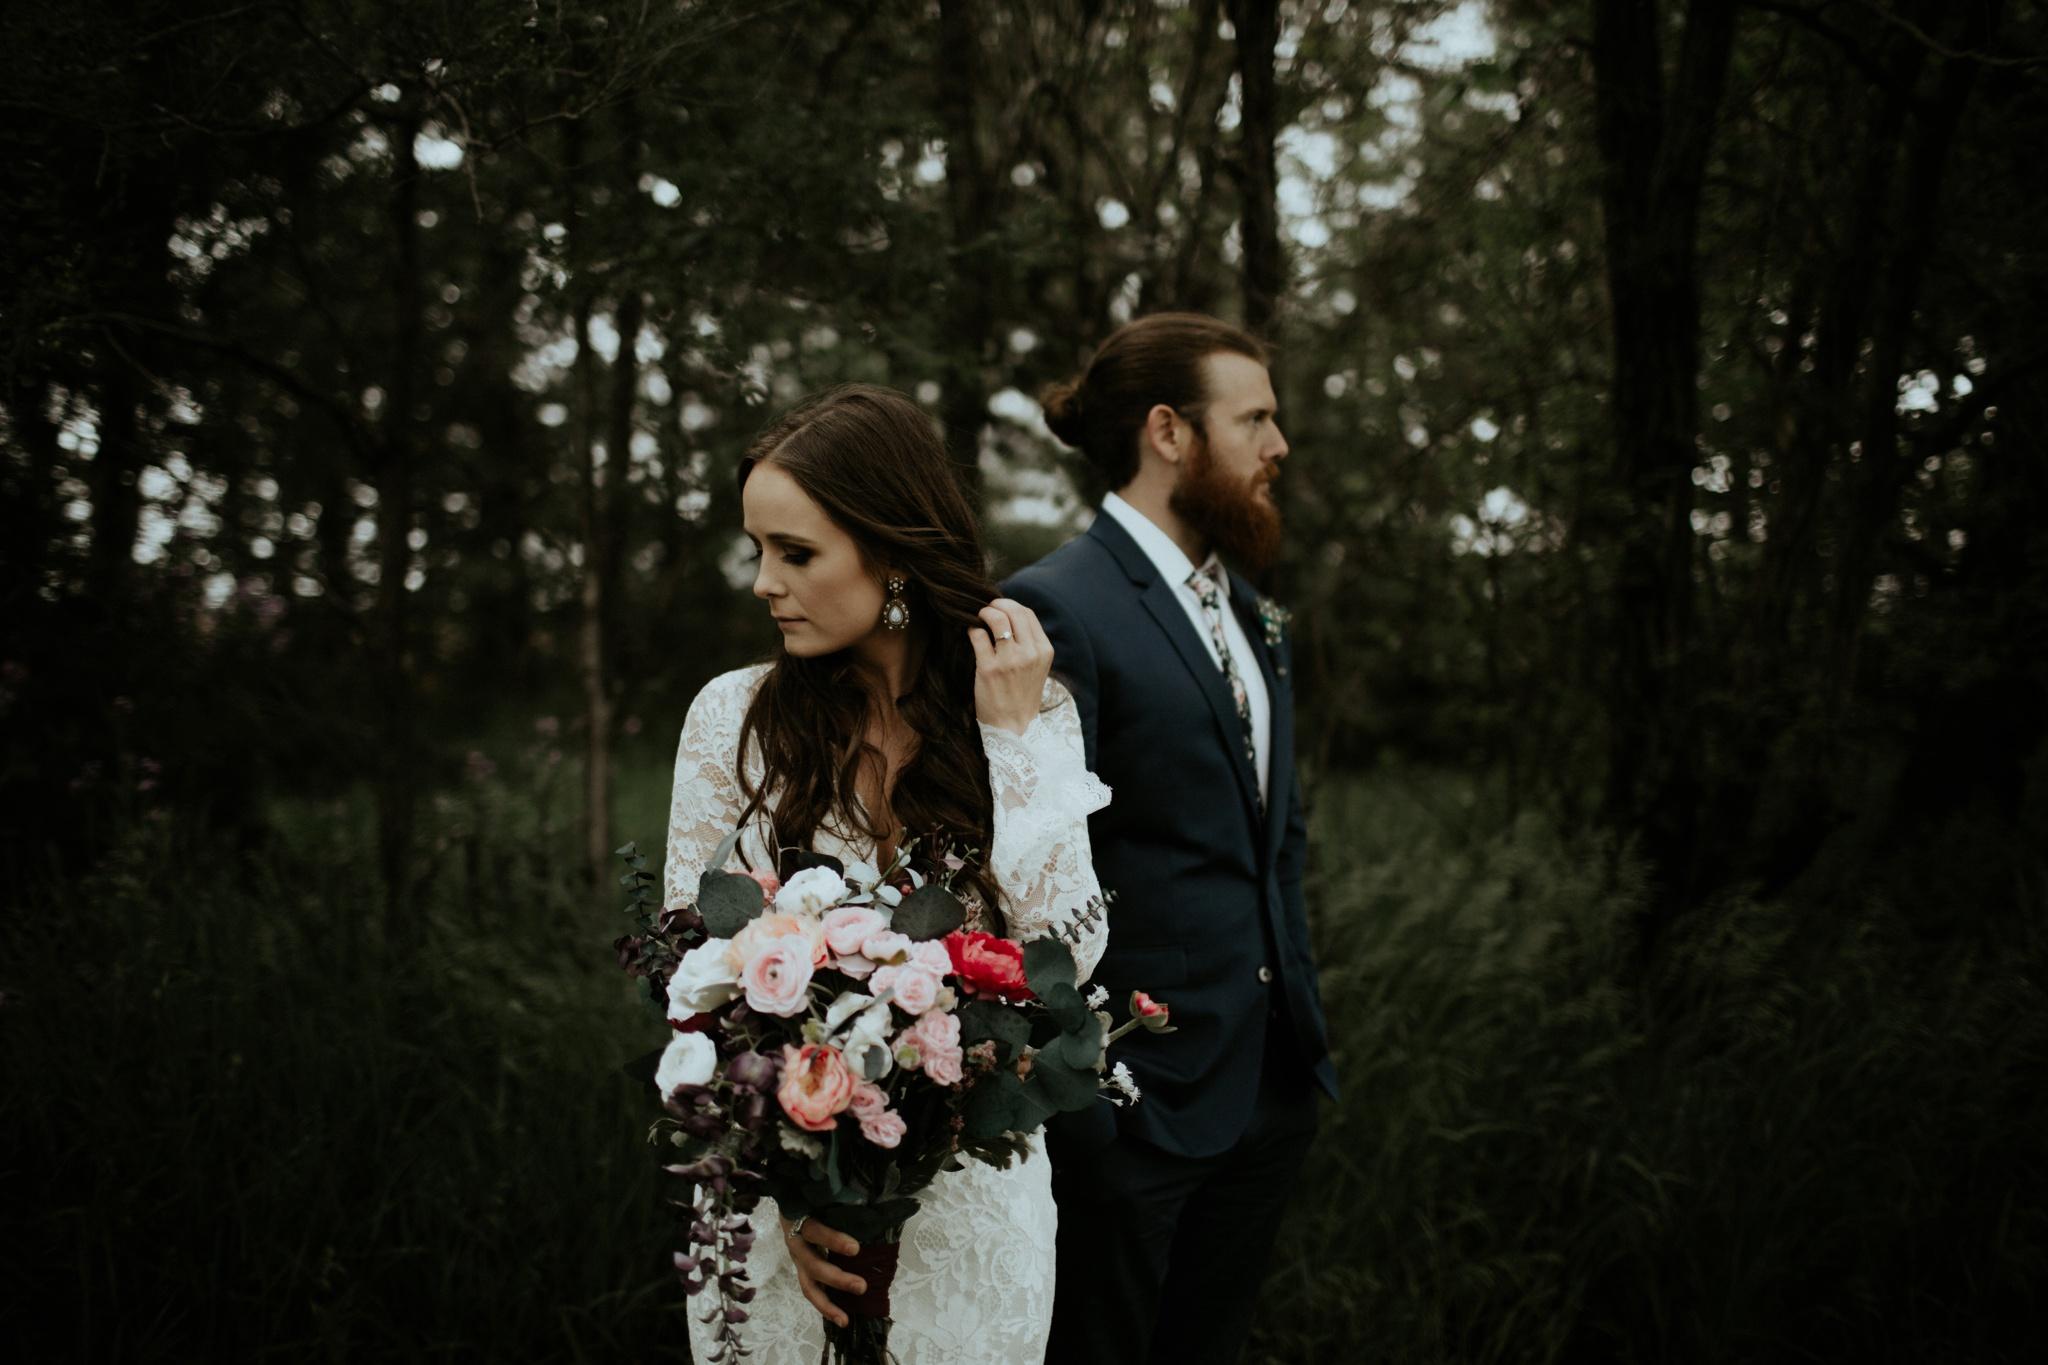 trinjensen photography, nebraska outdoor wedding photographer_3067.jpg